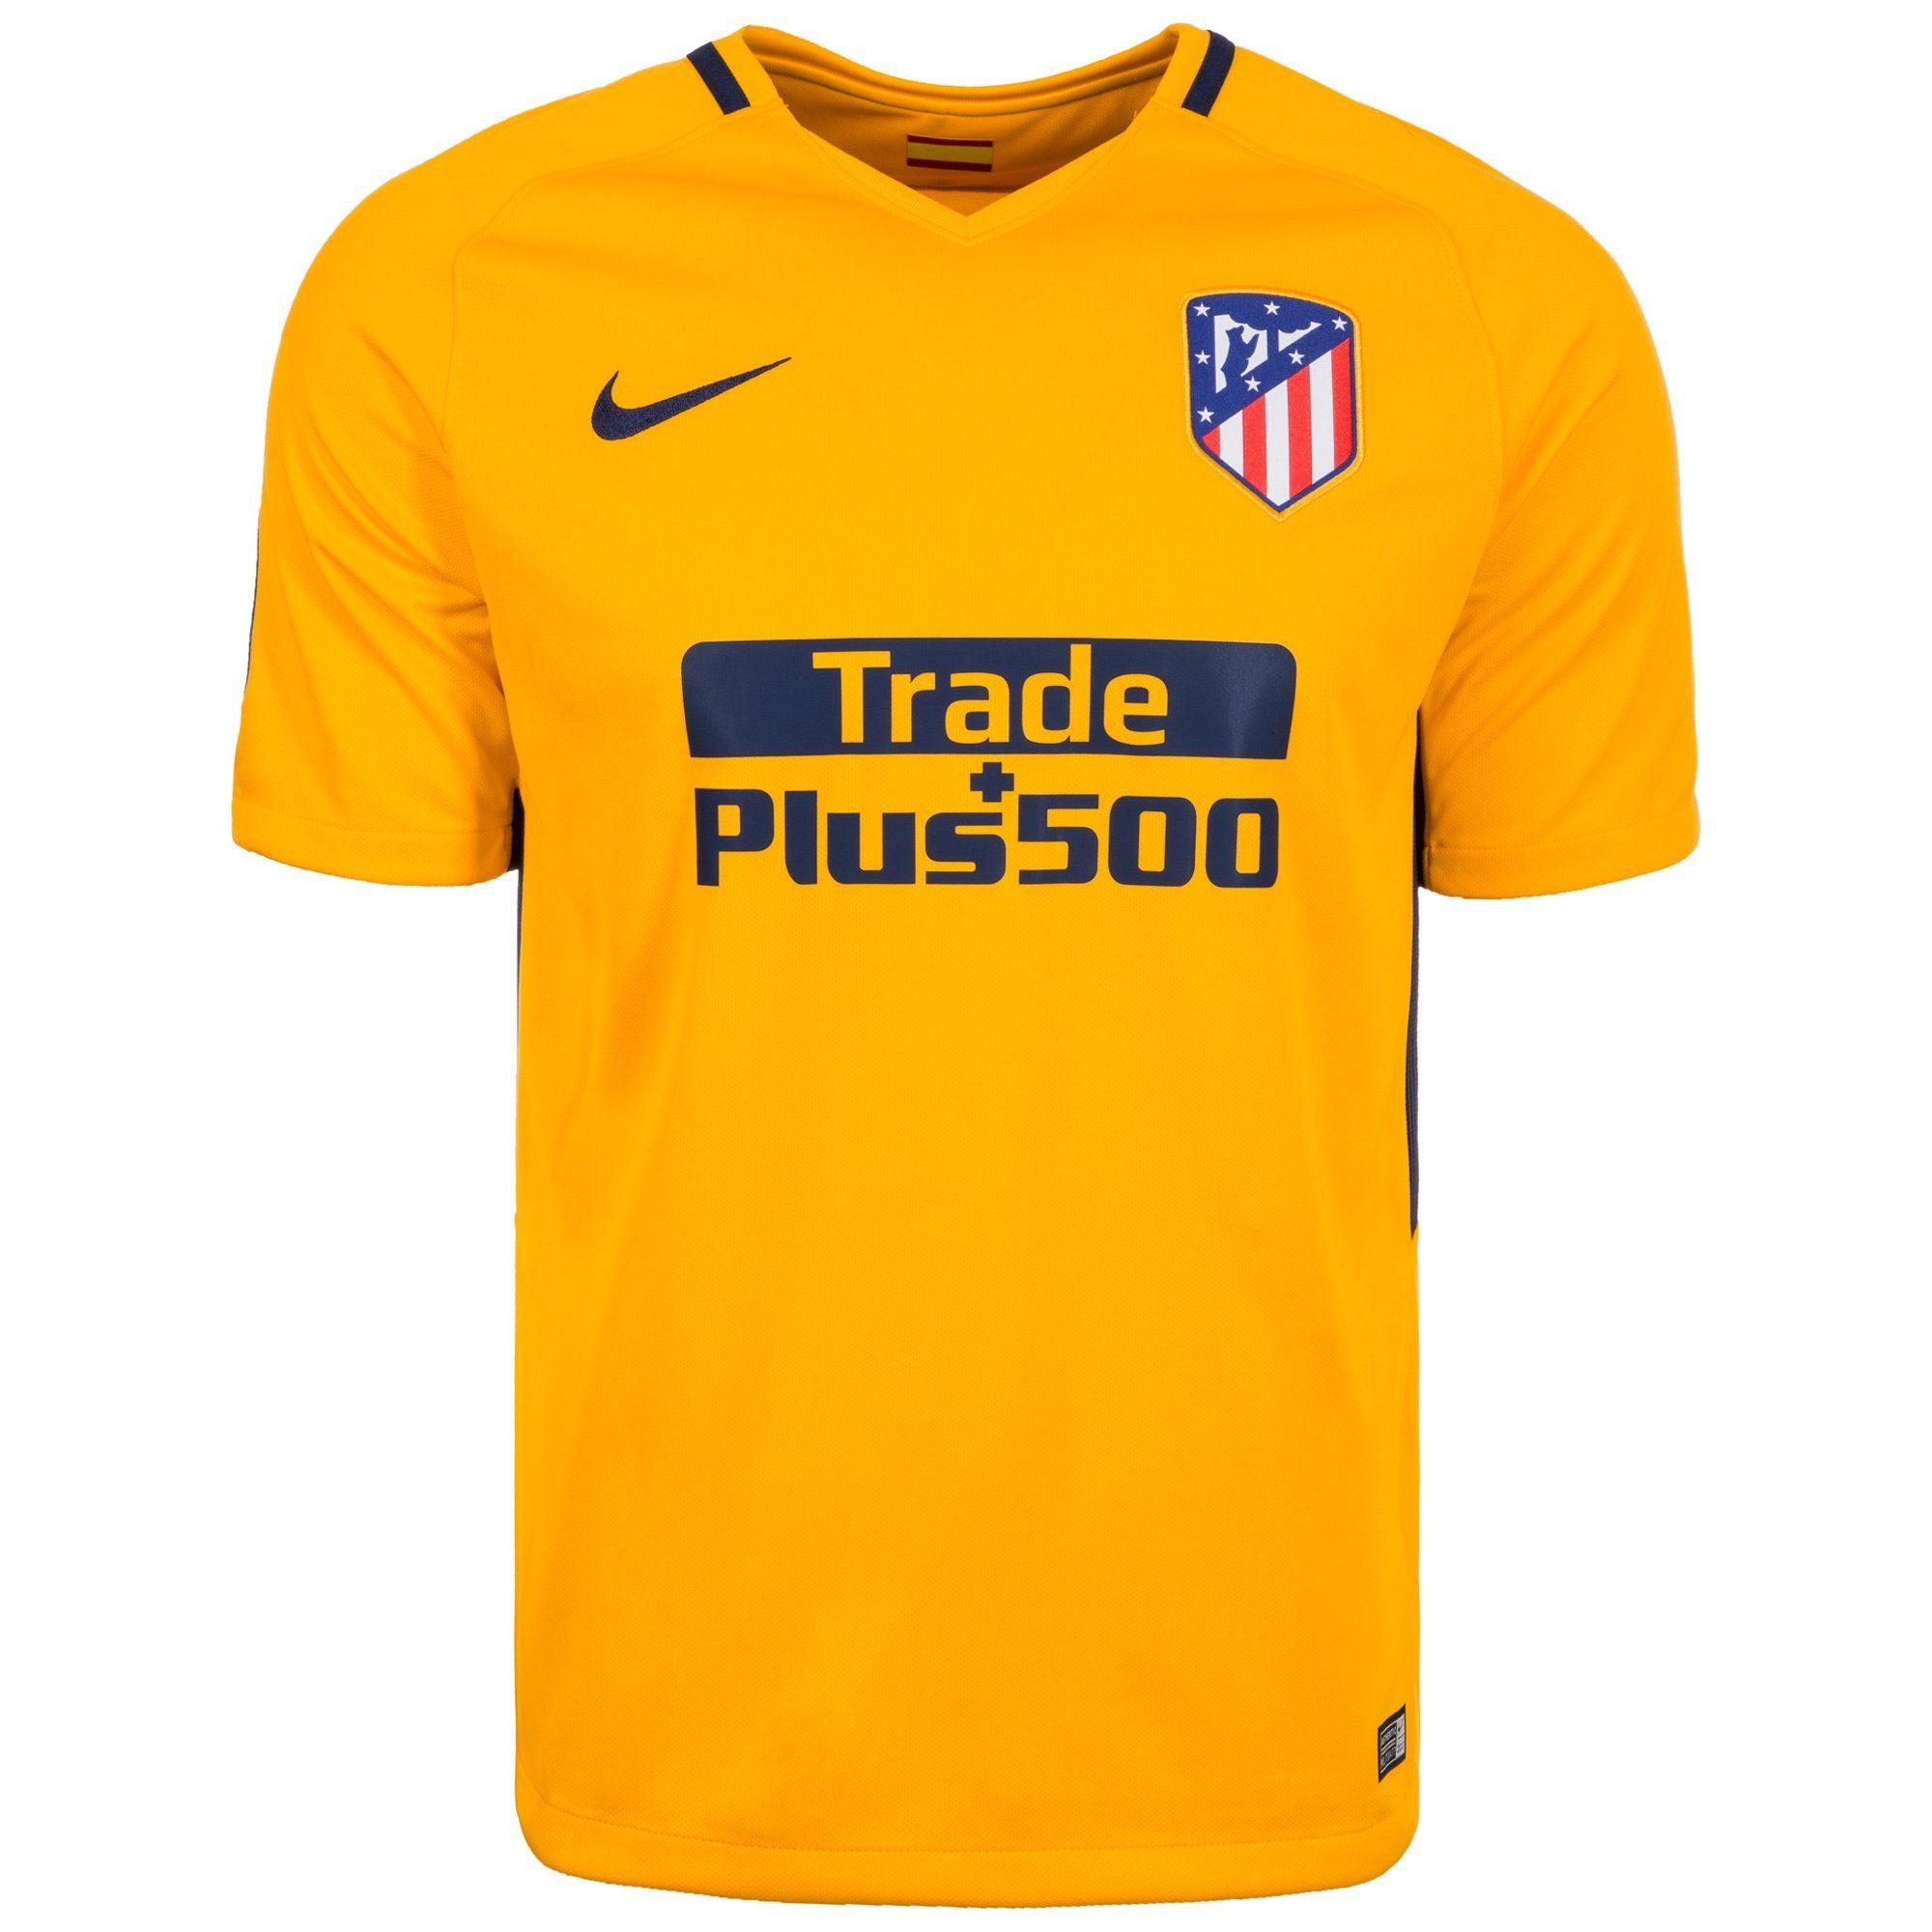 Nike Fußballtrikot Atletico Madrid Stadium 17/18 Auswärts | Sportbekleidung > Trikots > Fußballtrikots | Gelb | Trikot | Nike